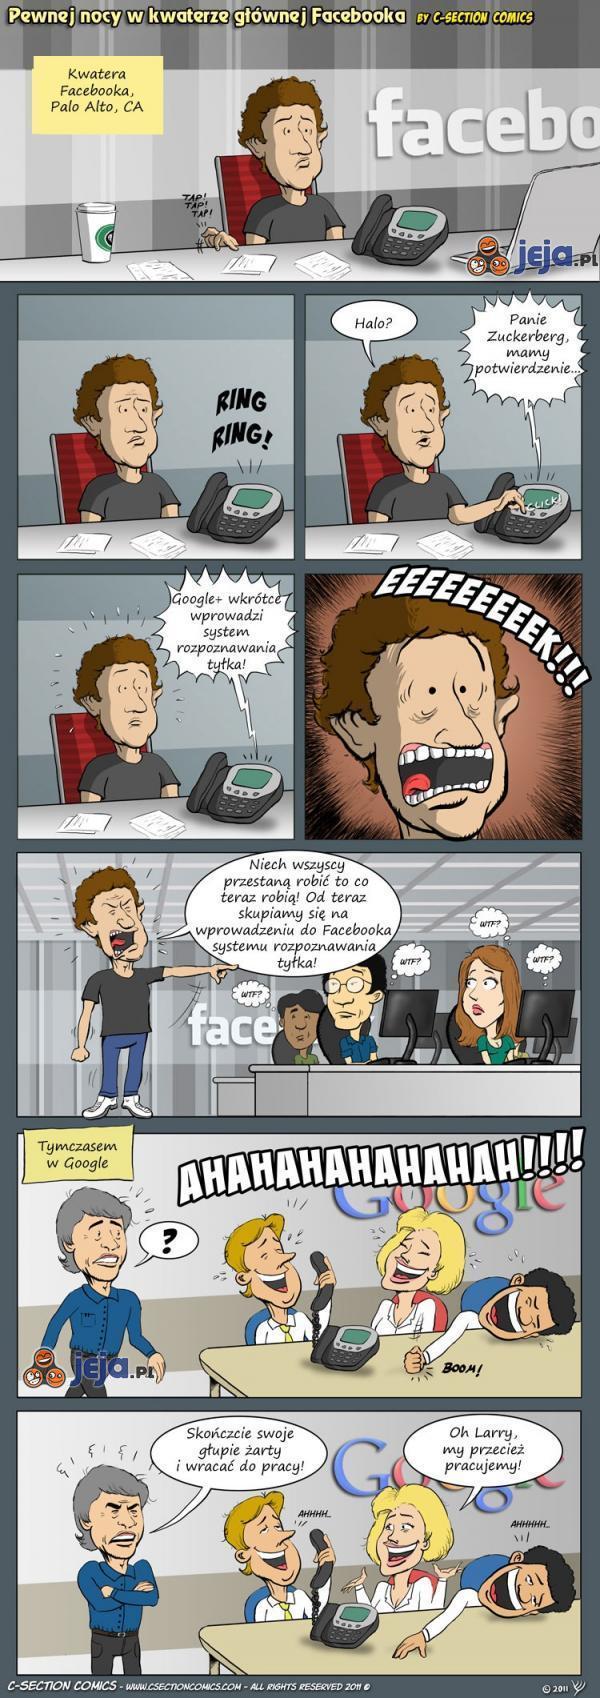 Trollowanie Facebooka